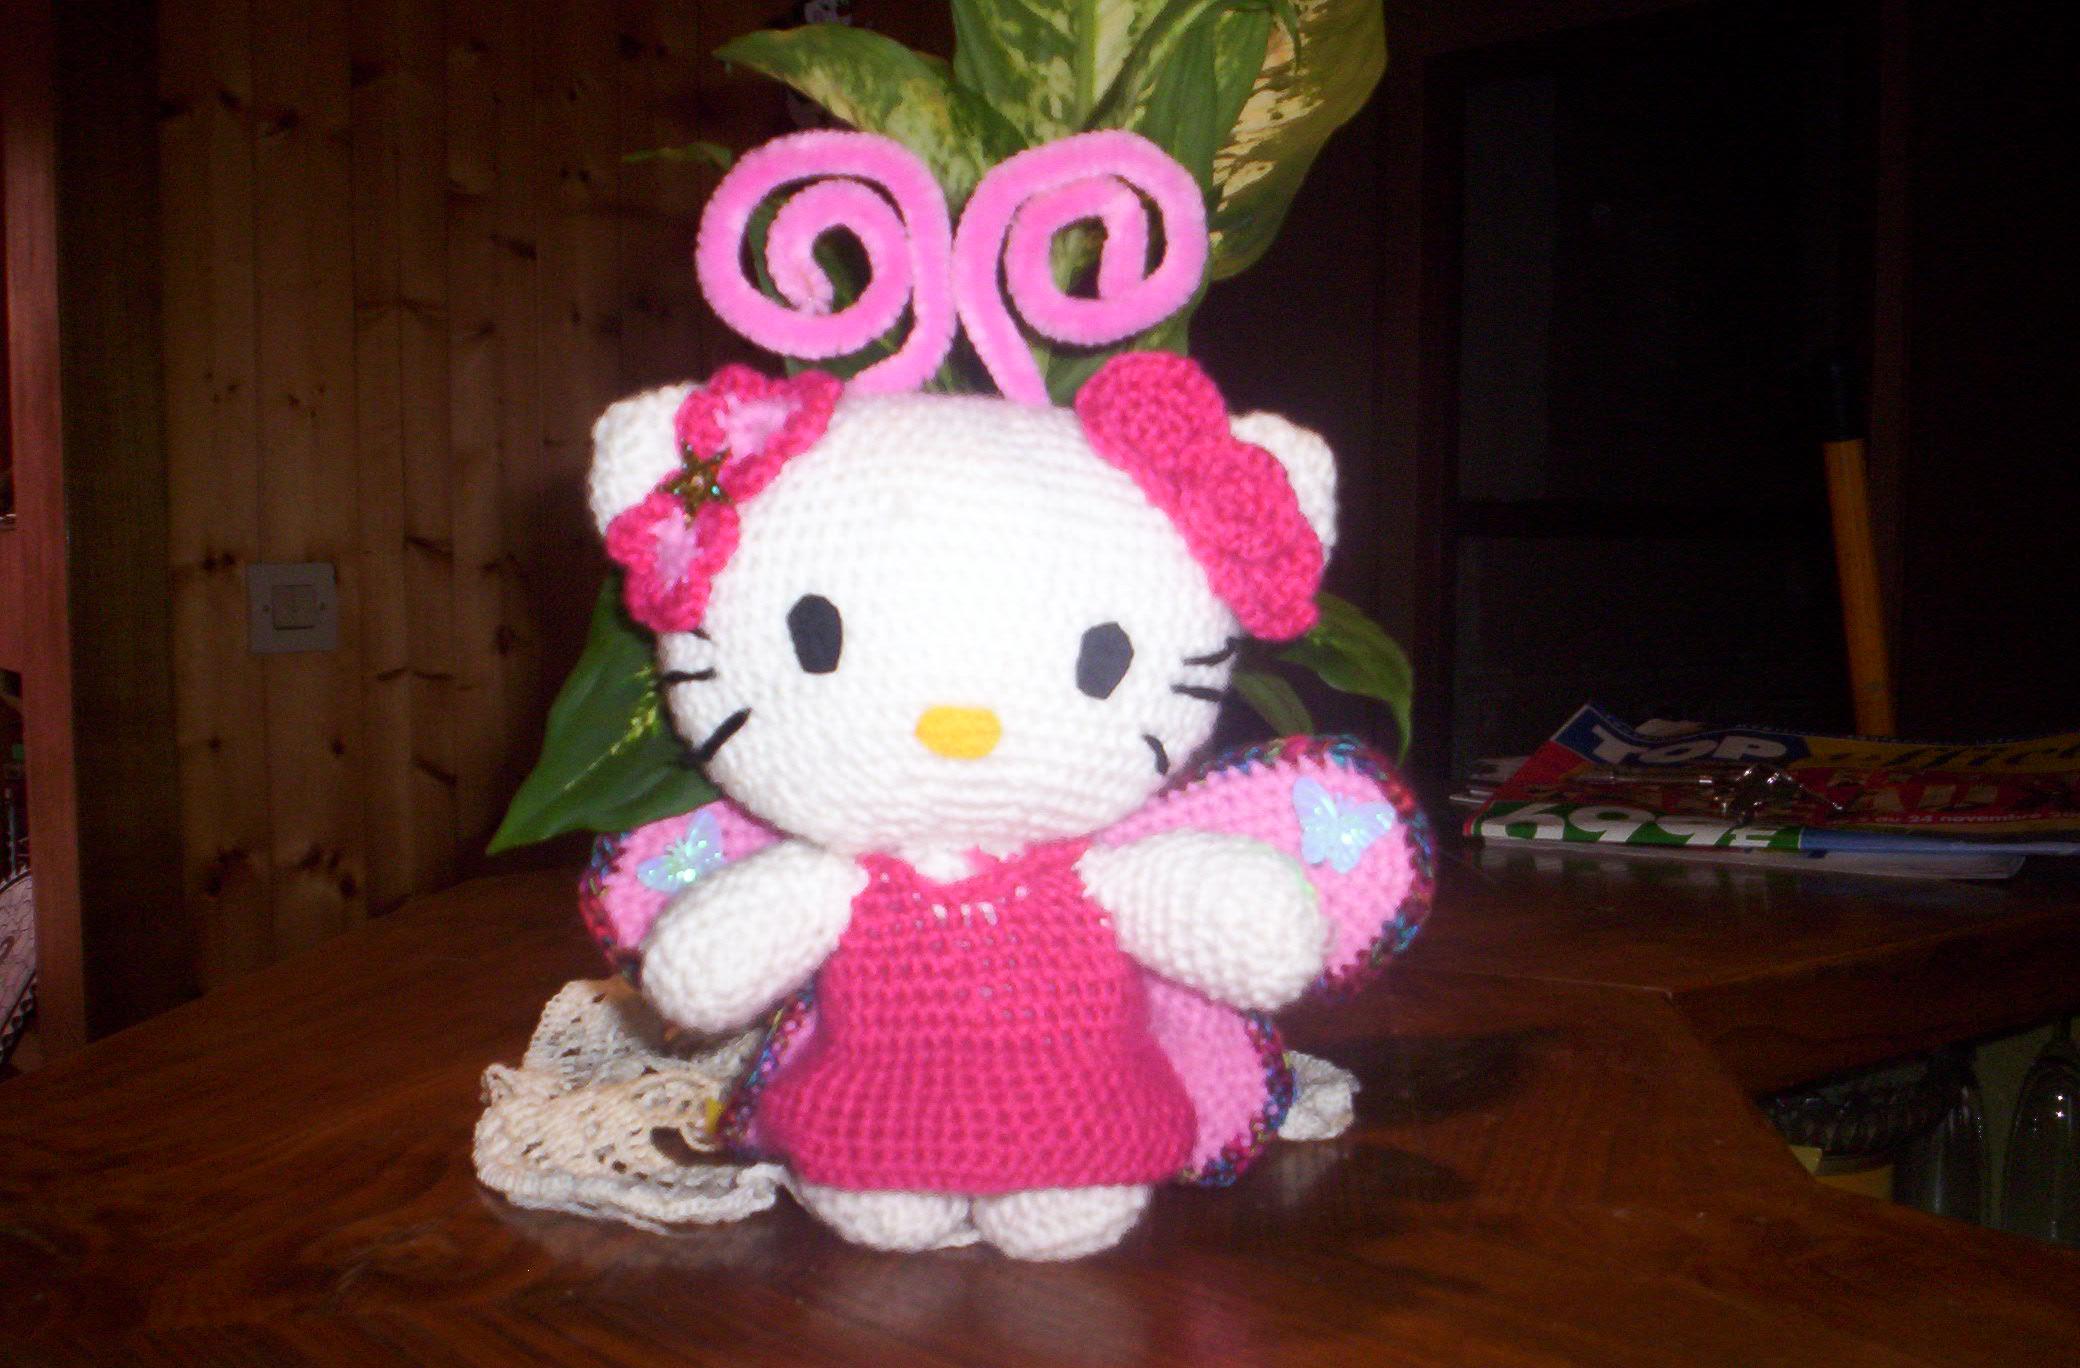 Tuto Gratuit Amigurumi Hello Kitty : Lea Ptitudes? AMIGURUMIS